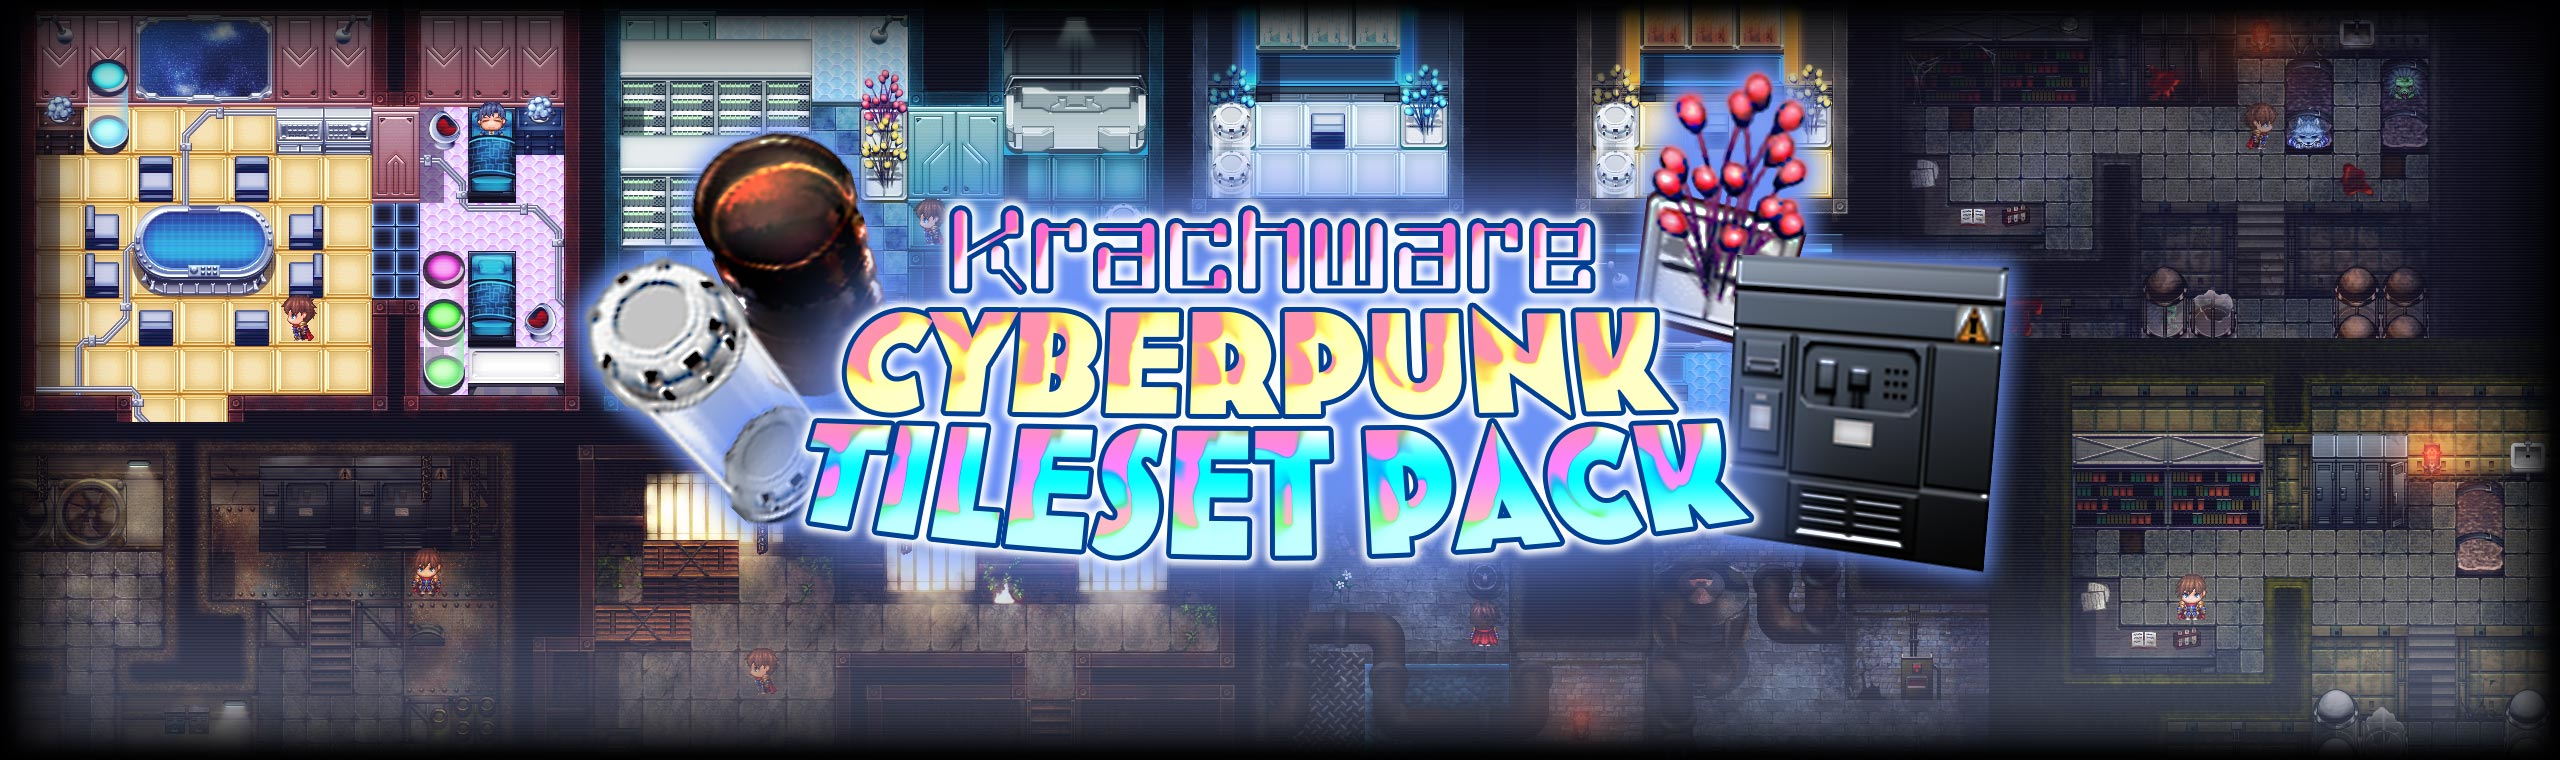 Krachware Cyberpunk Tileset Pack